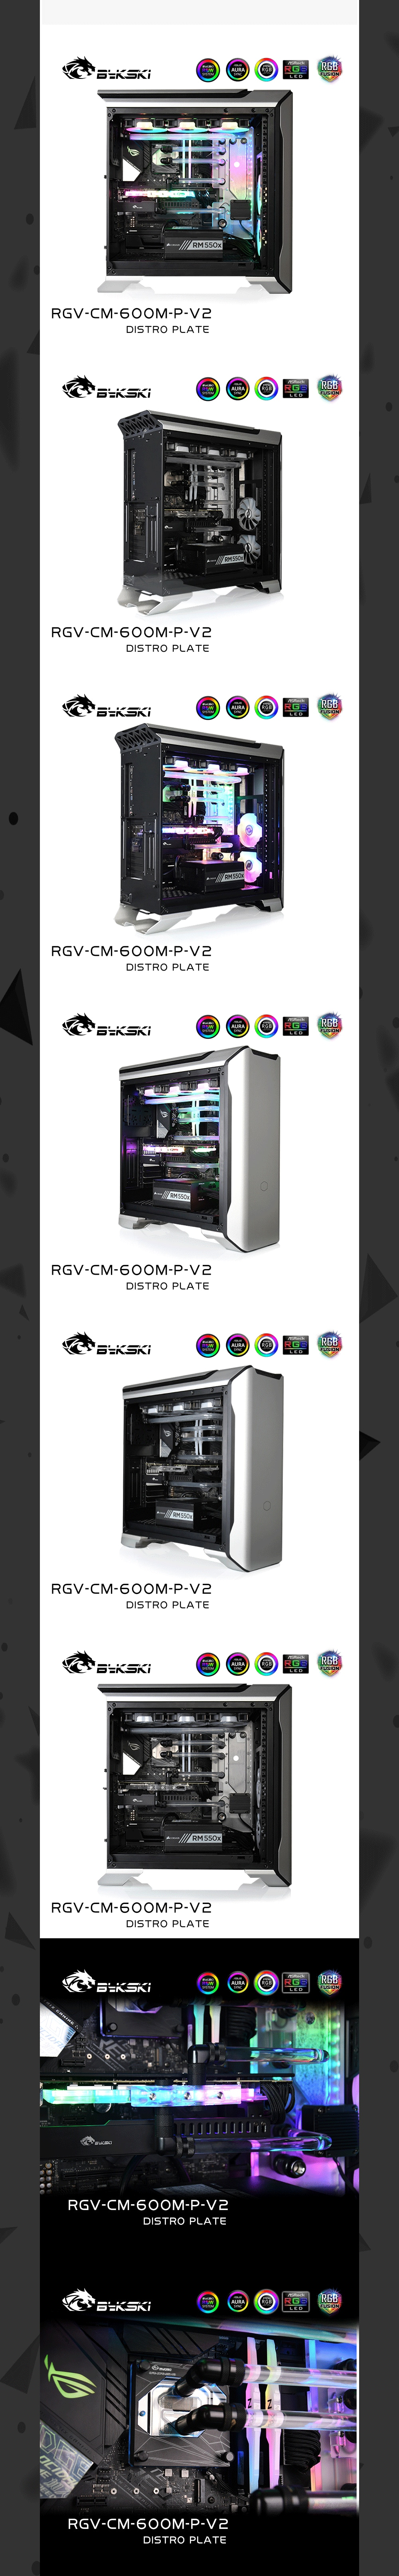 Bykski Waterway Cooling Kit For CoolerMaster SL600M Case, 5V ARGB, For Single GPU Building, RGV-CM-600M-P-V2